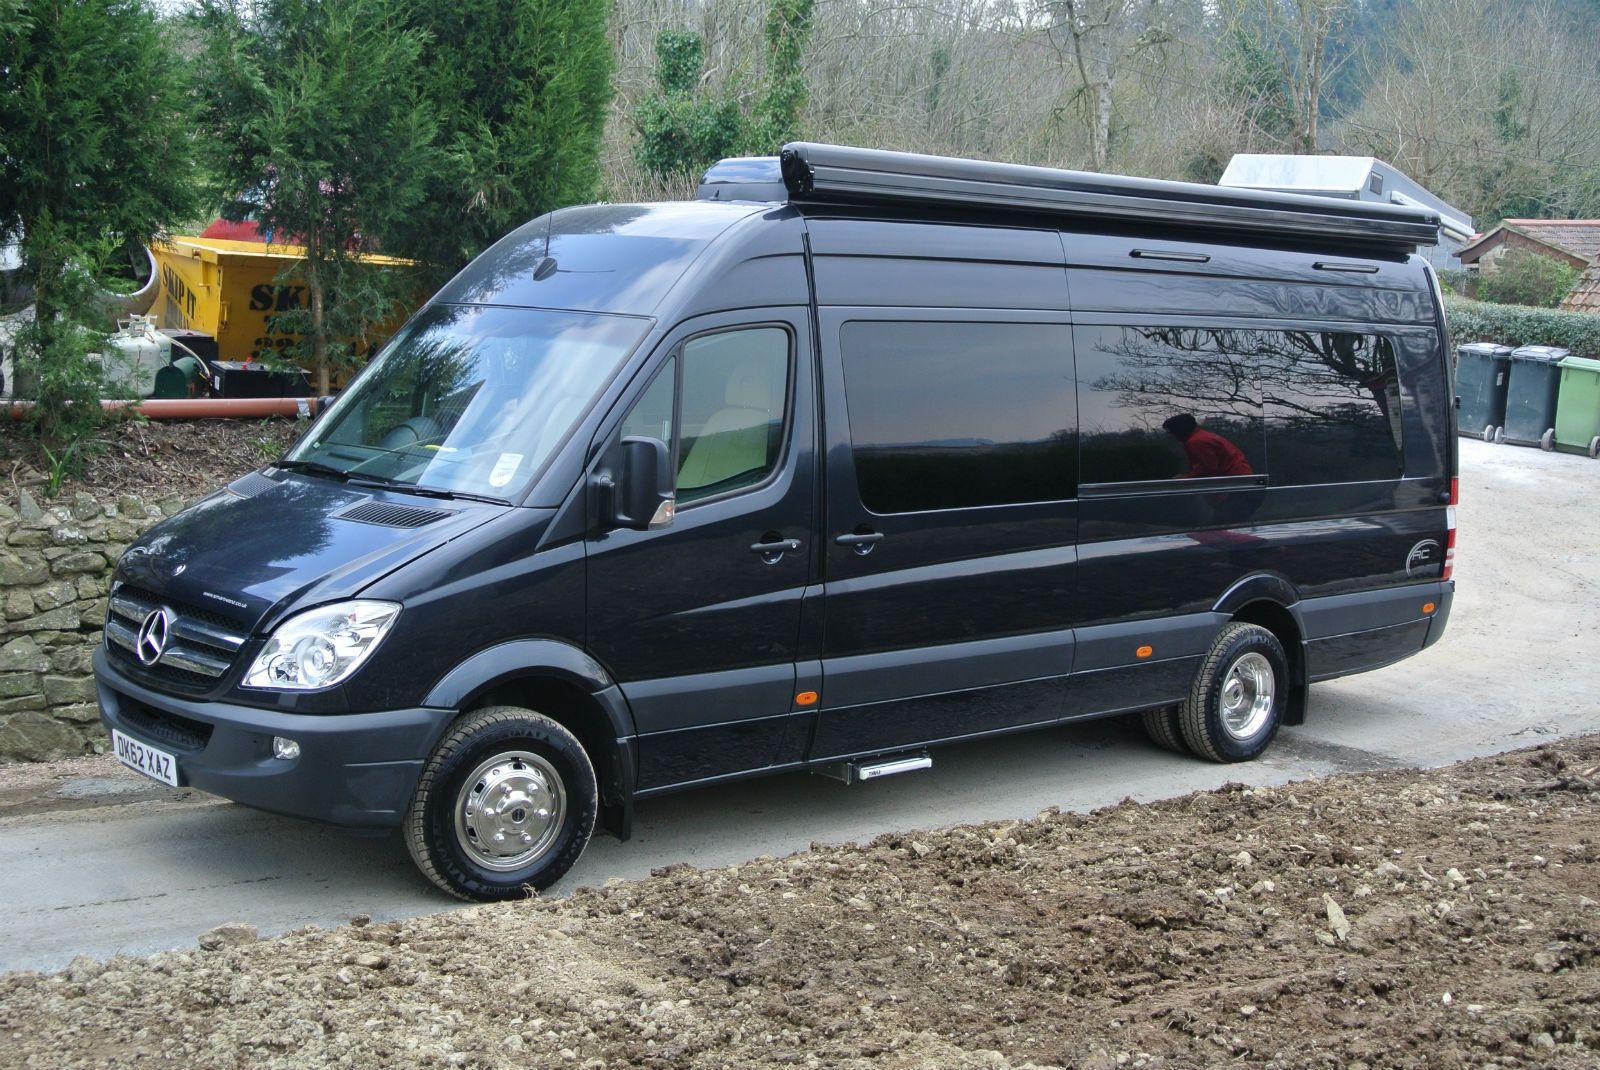 Rc Motorhomes Mercedes Benz Sprinter 519 Cdi Motorhome Now Sold Ebay Benz Sprinter Benz Sprinter